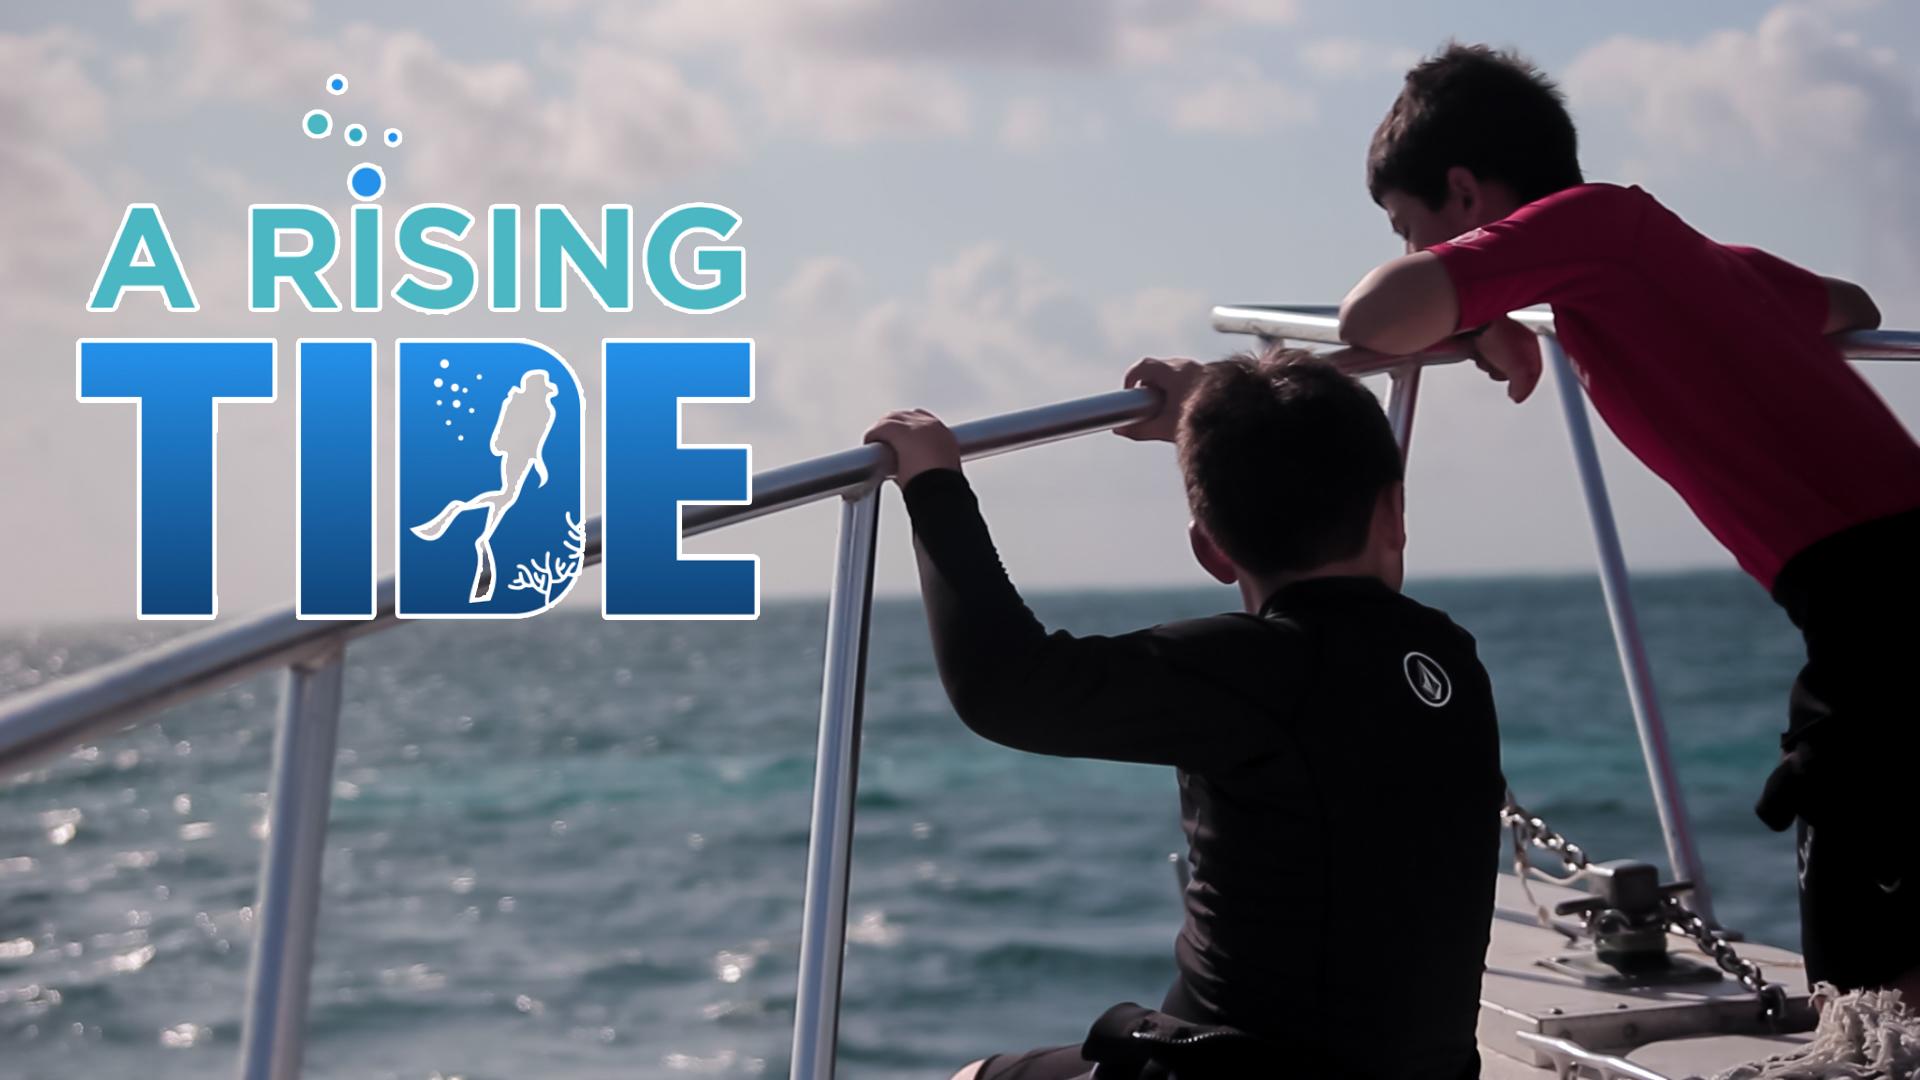 A Rising Tide, scholarship, marine science, education, scuba, diving, ocean